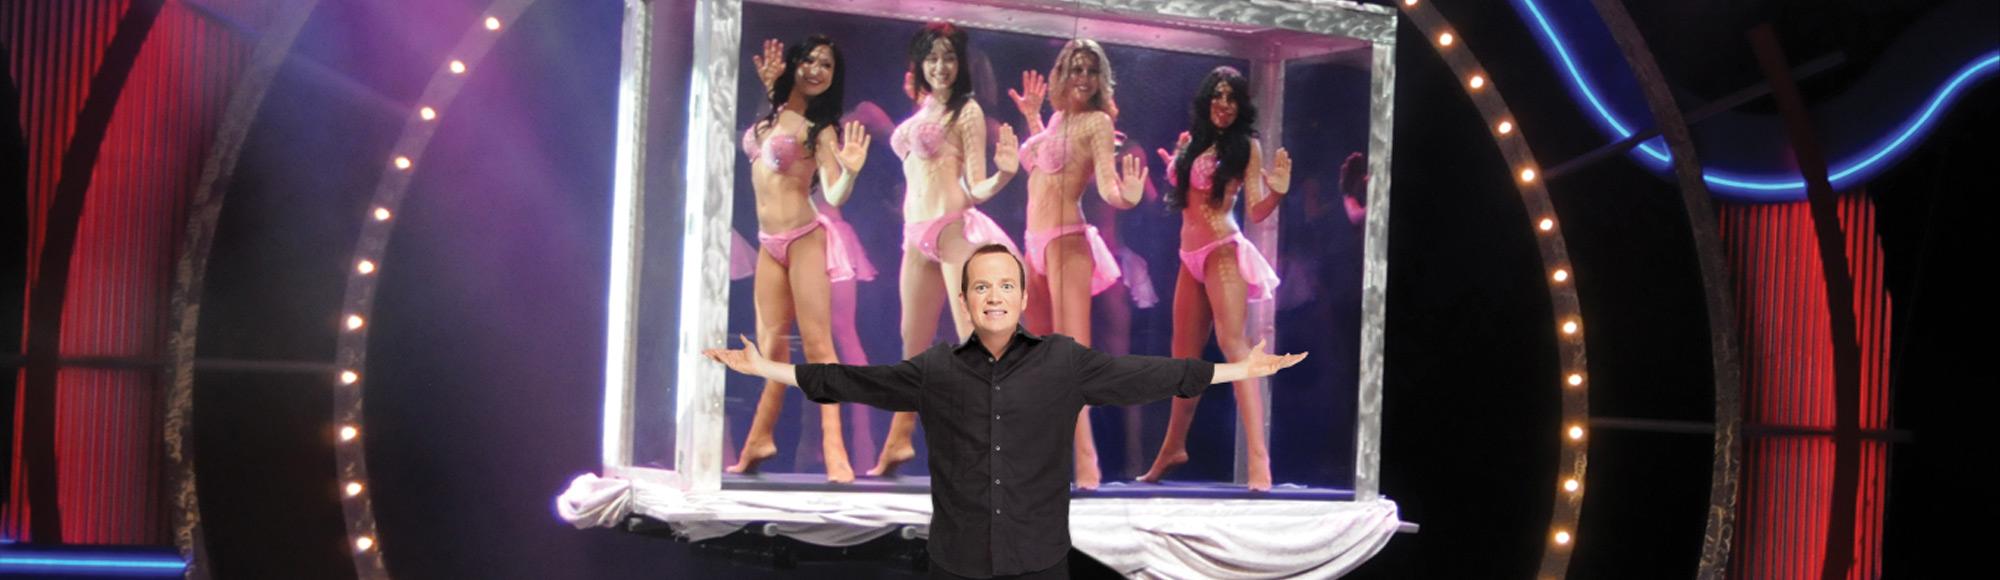 Nathan Burton Comedy Magic Show show